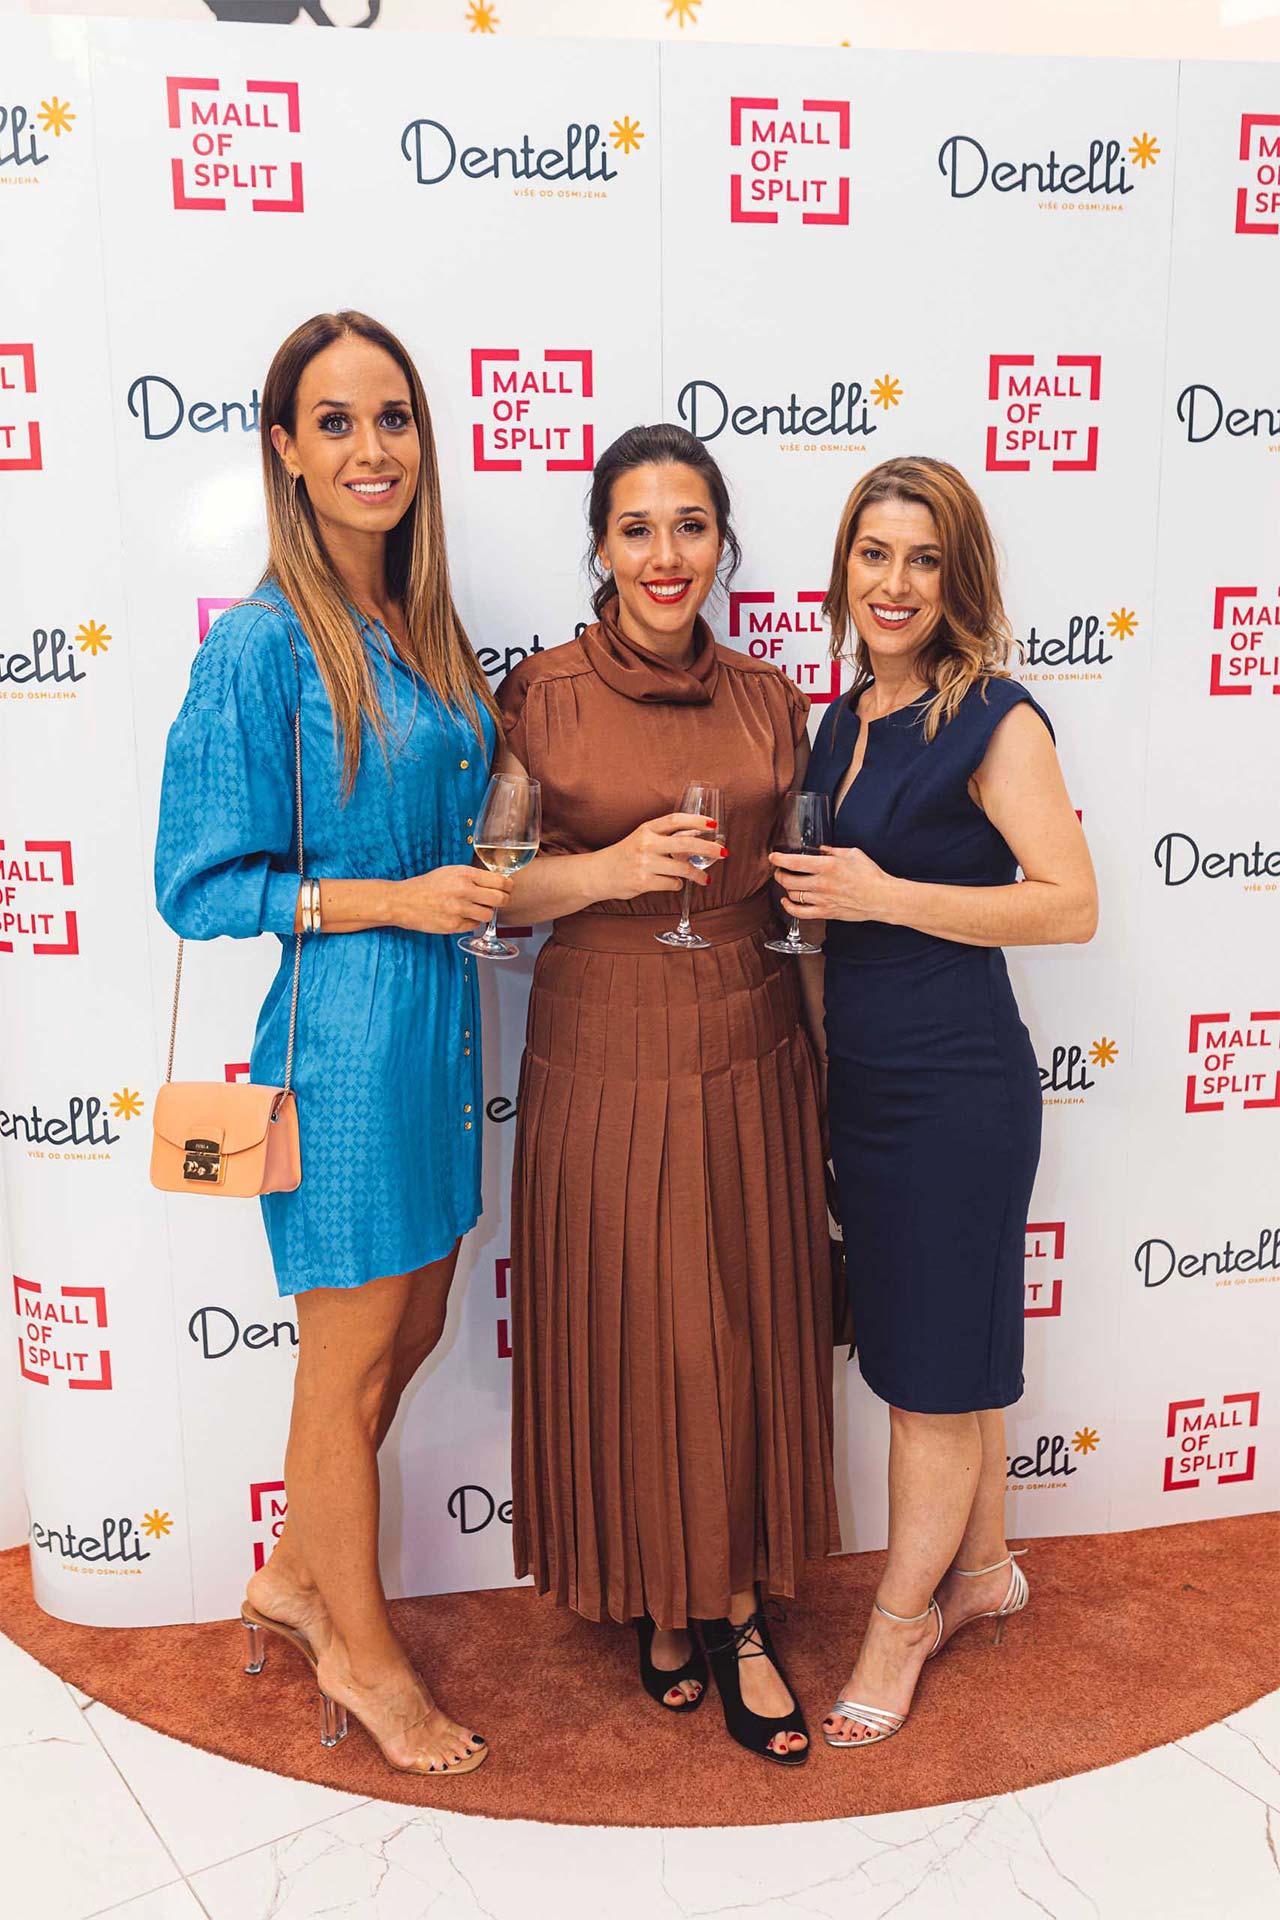 Dentelli Fashion Show - Wall of Fame (7)